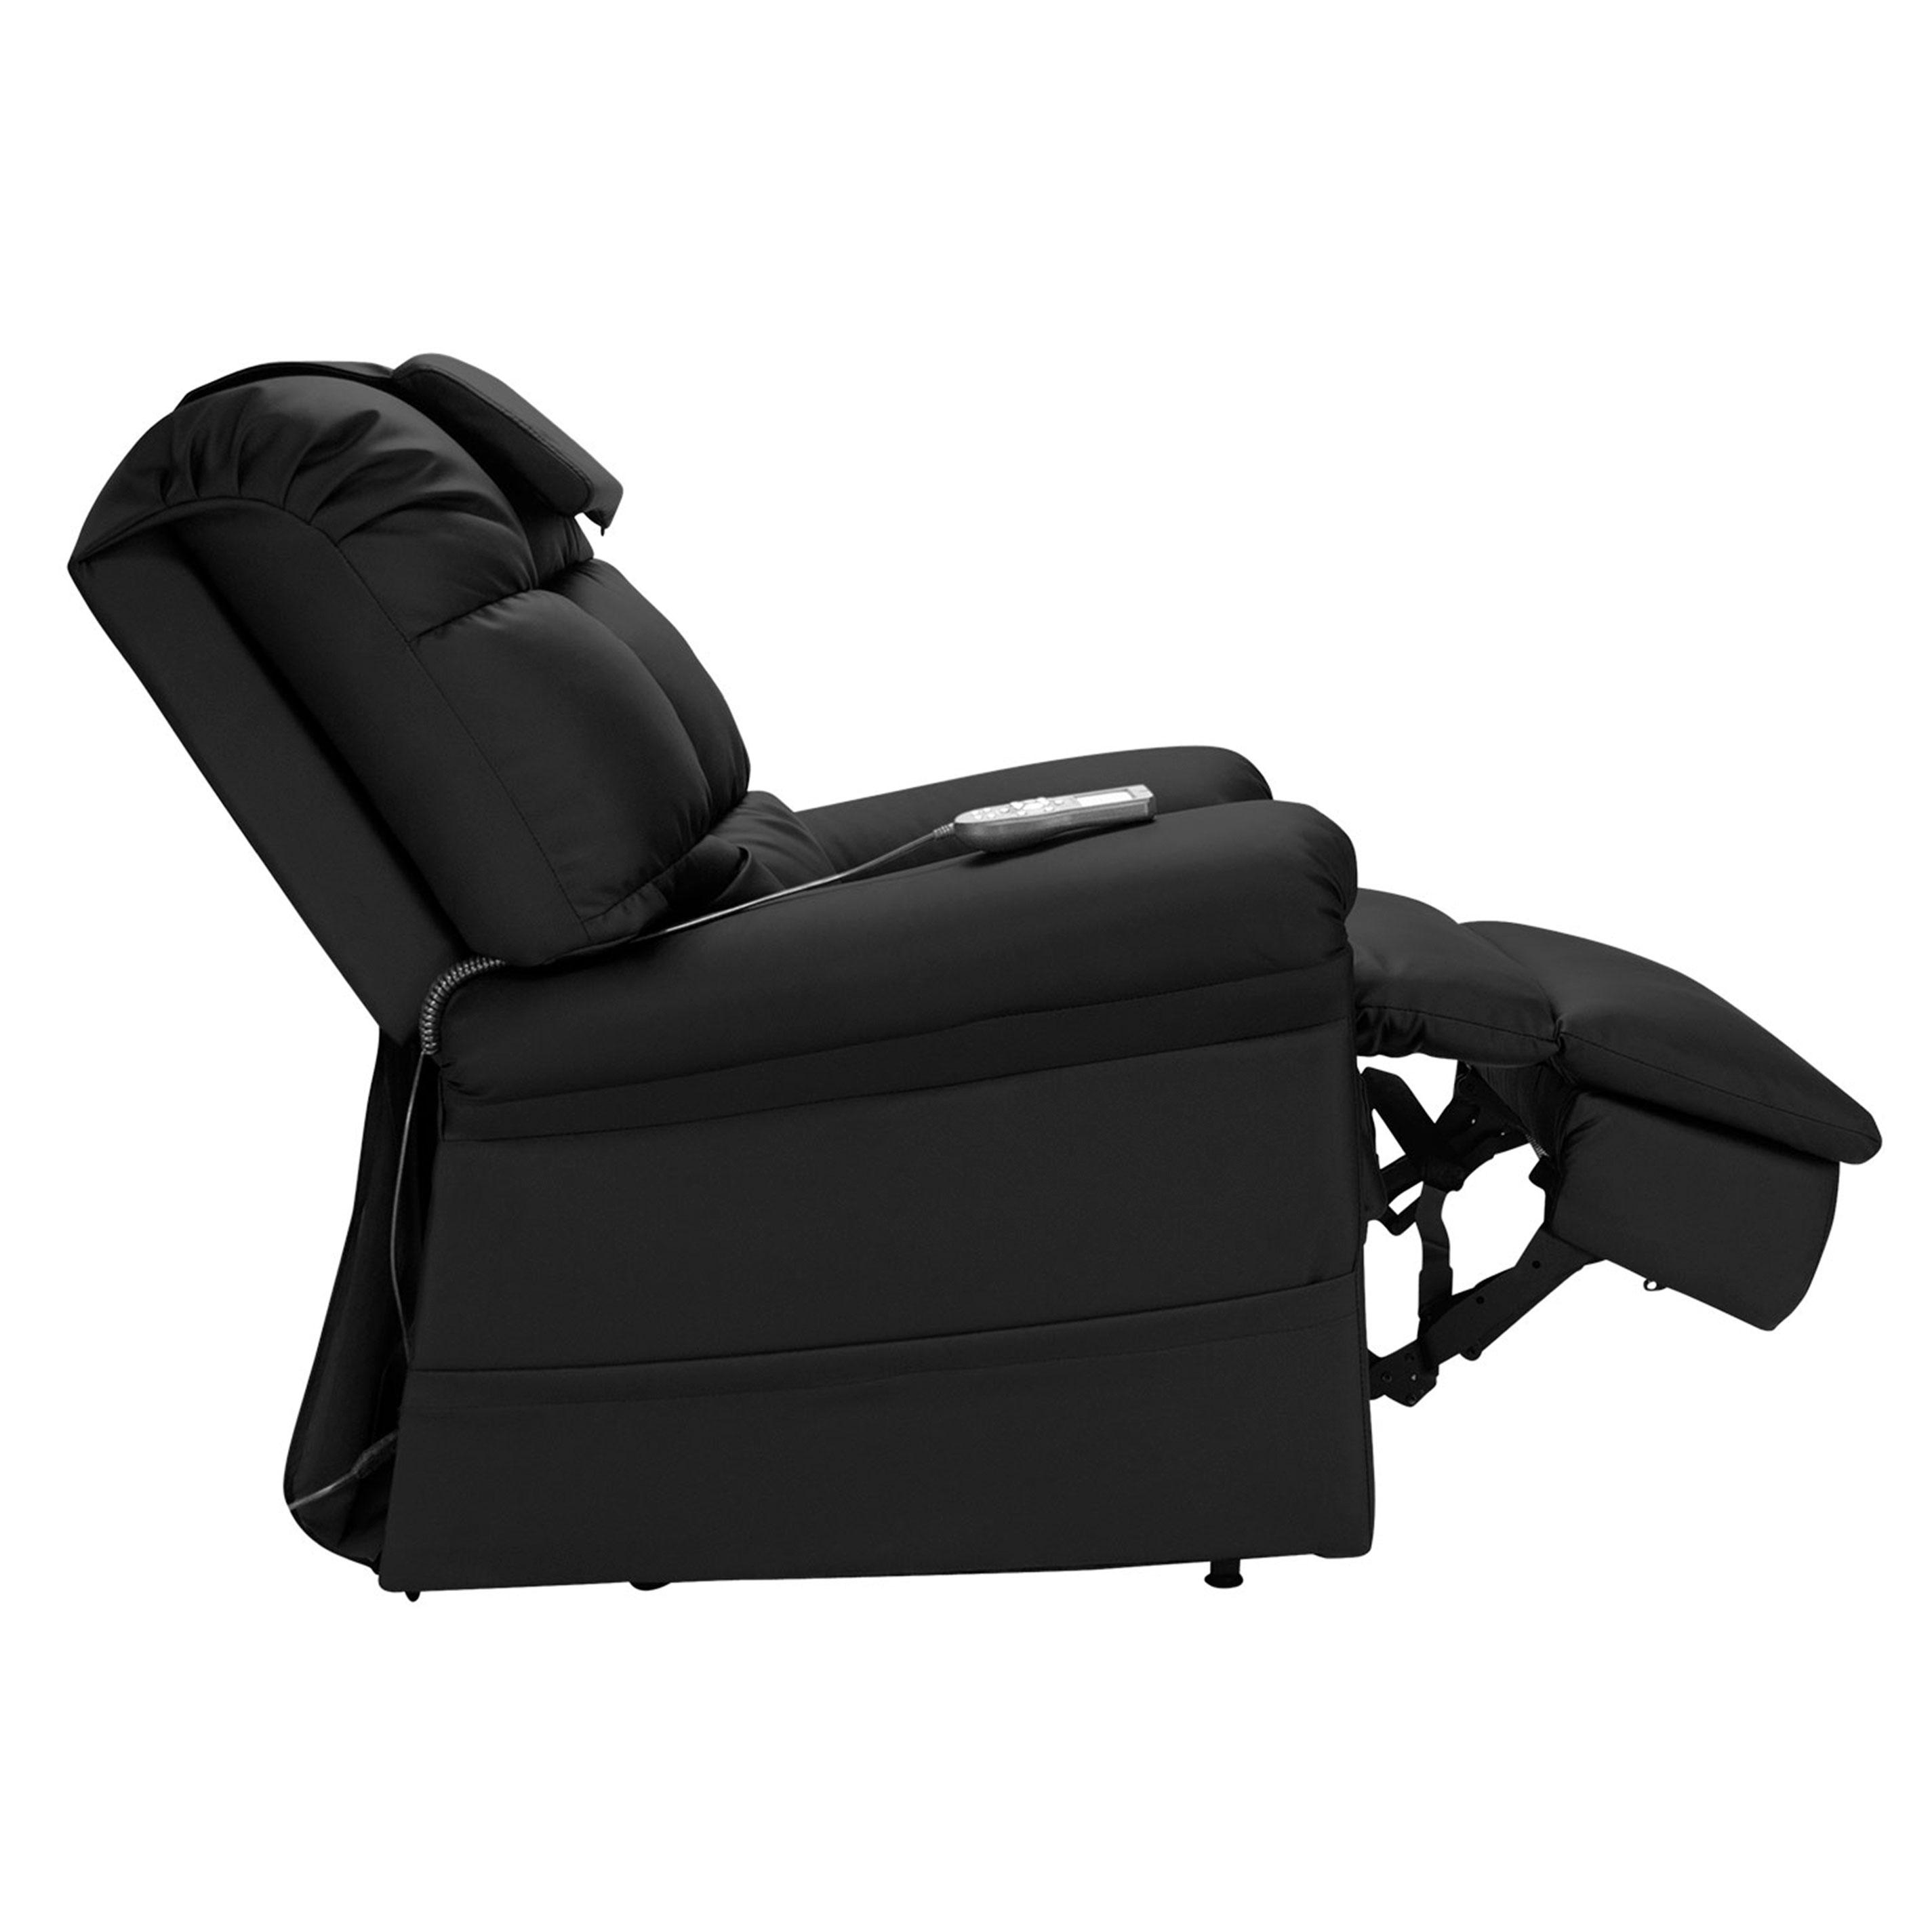 Incredible Wiselift 450 Sleeper Lift Chair Recliner Midnight Enduralux Leather Machost Co Dining Chair Design Ideas Machostcouk